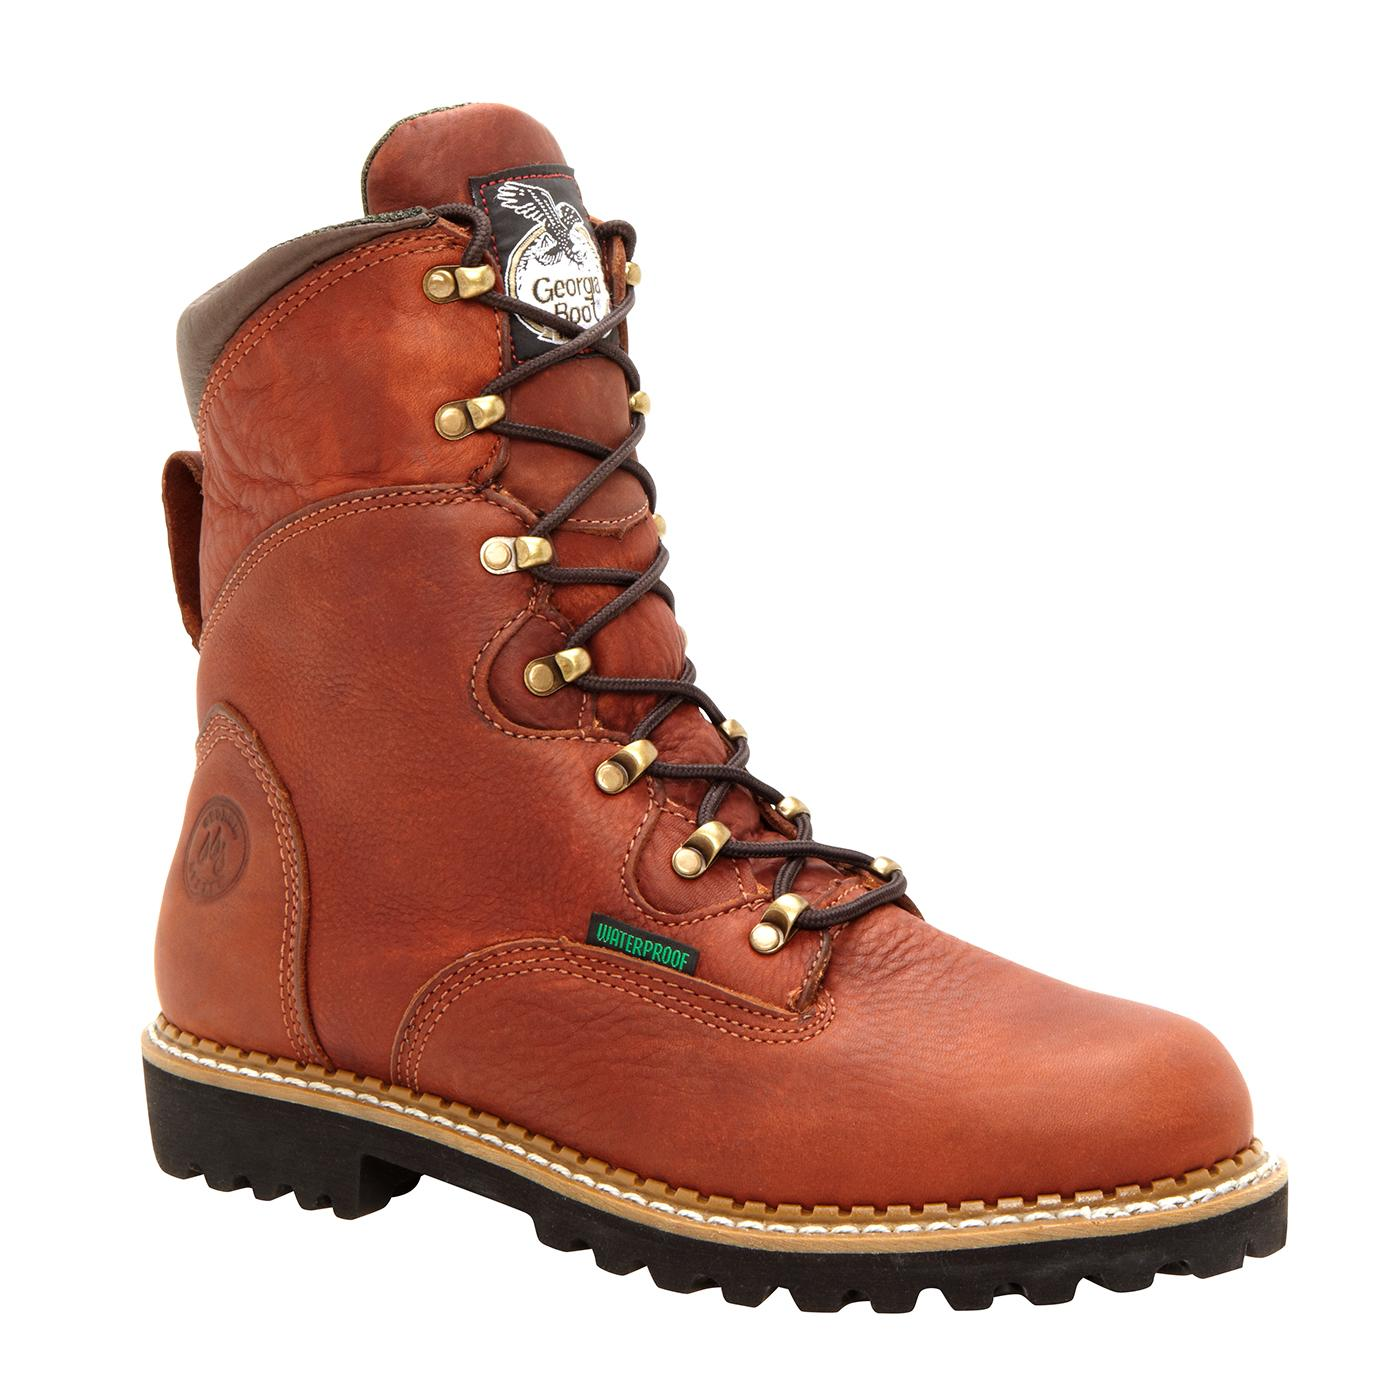 f1ba660fda4 Georgia Renegades Waterproof Steel Toe Work Boots